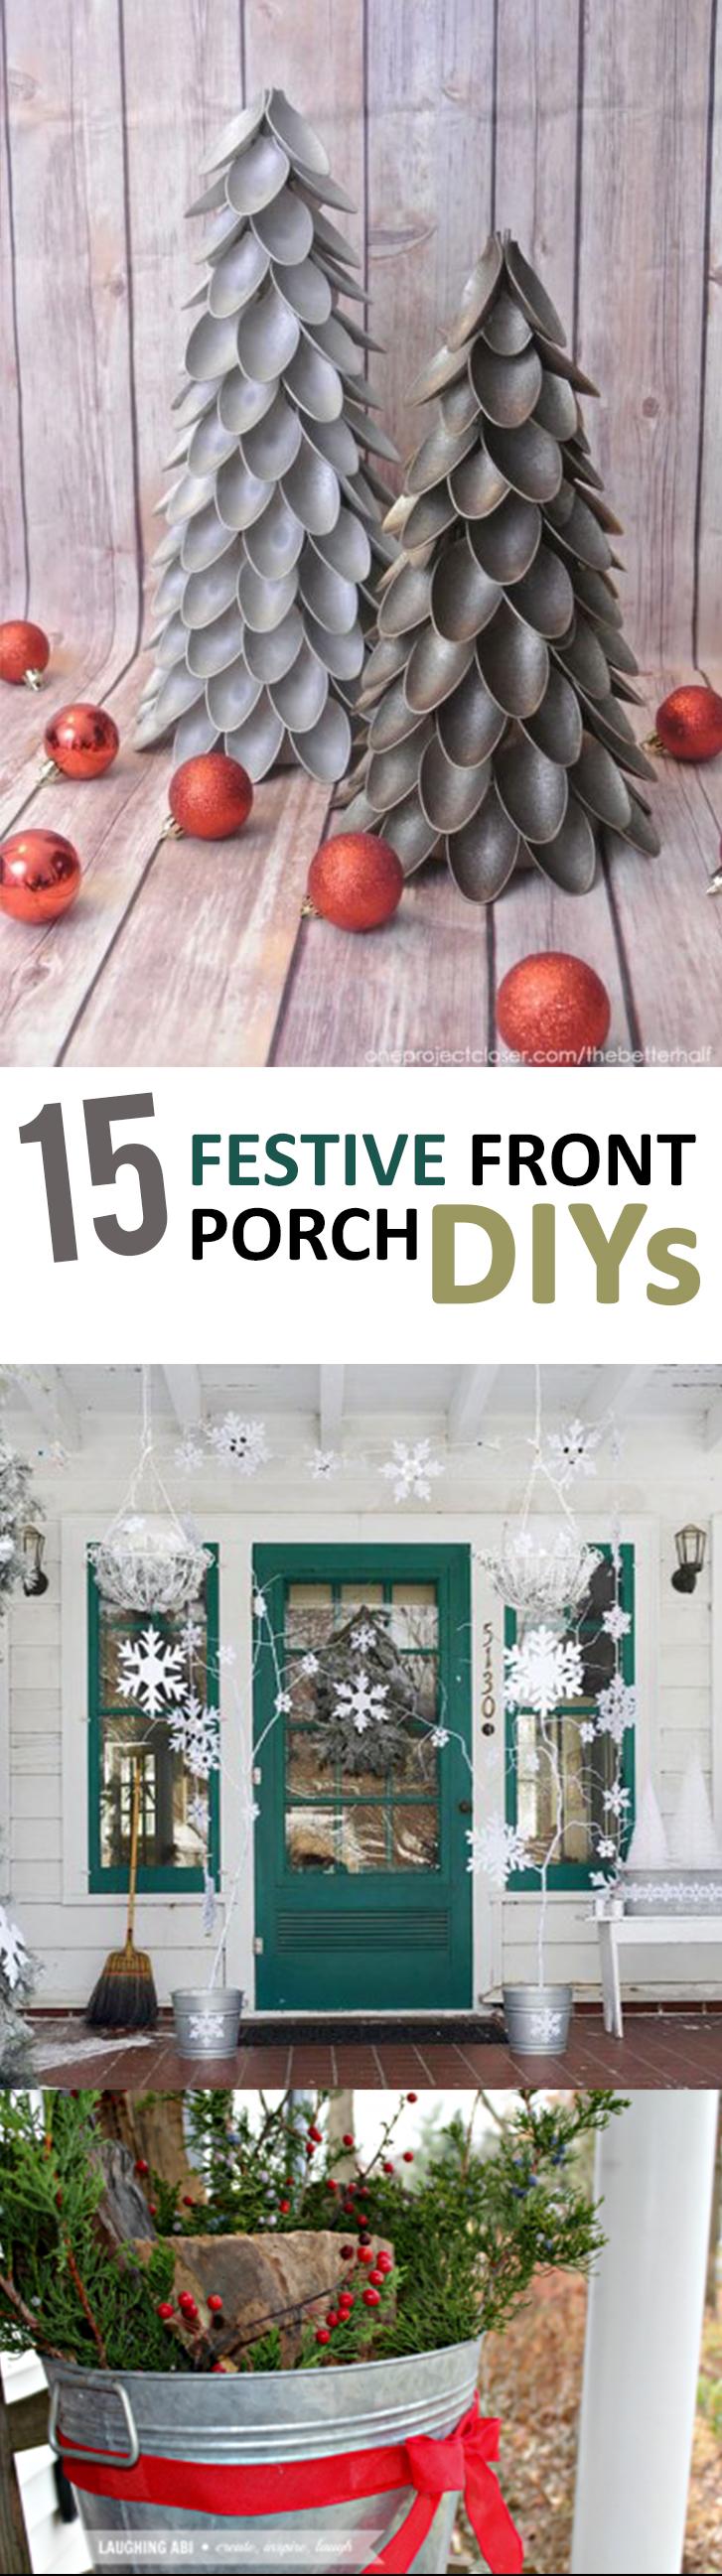 Front porch decor, DIY porch decor, popular pin, porch, Christmas, Christmas hacks, DIY holiday, holiday crafts, crafting,